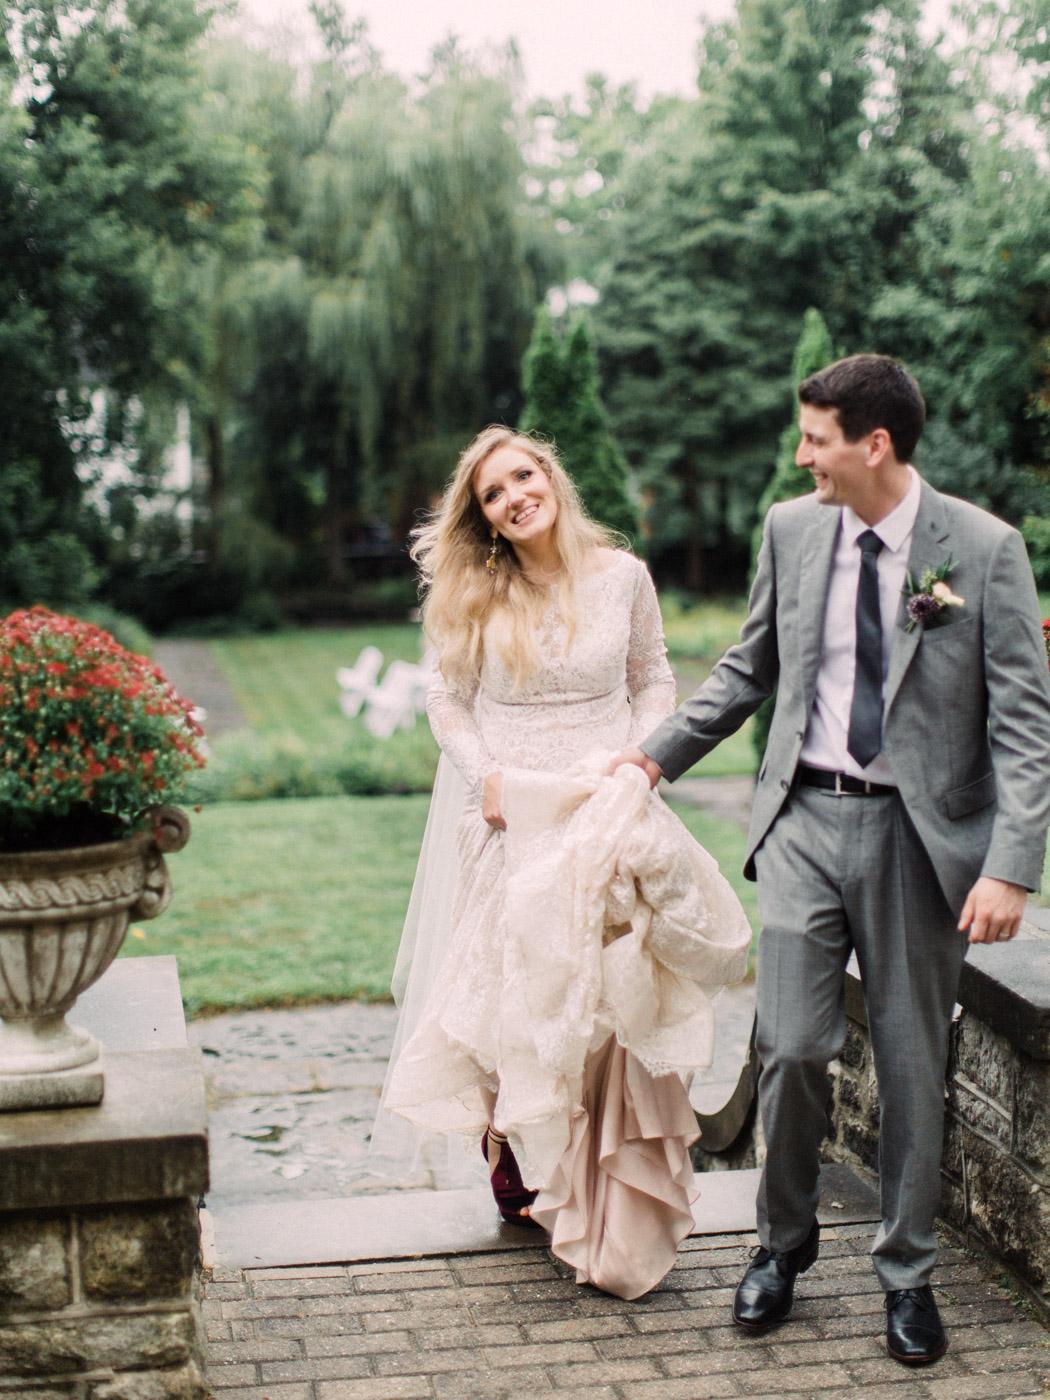 Toronto-wedding-photographer-intimate-classic-fine-art-elopement-ottawa69.jpg